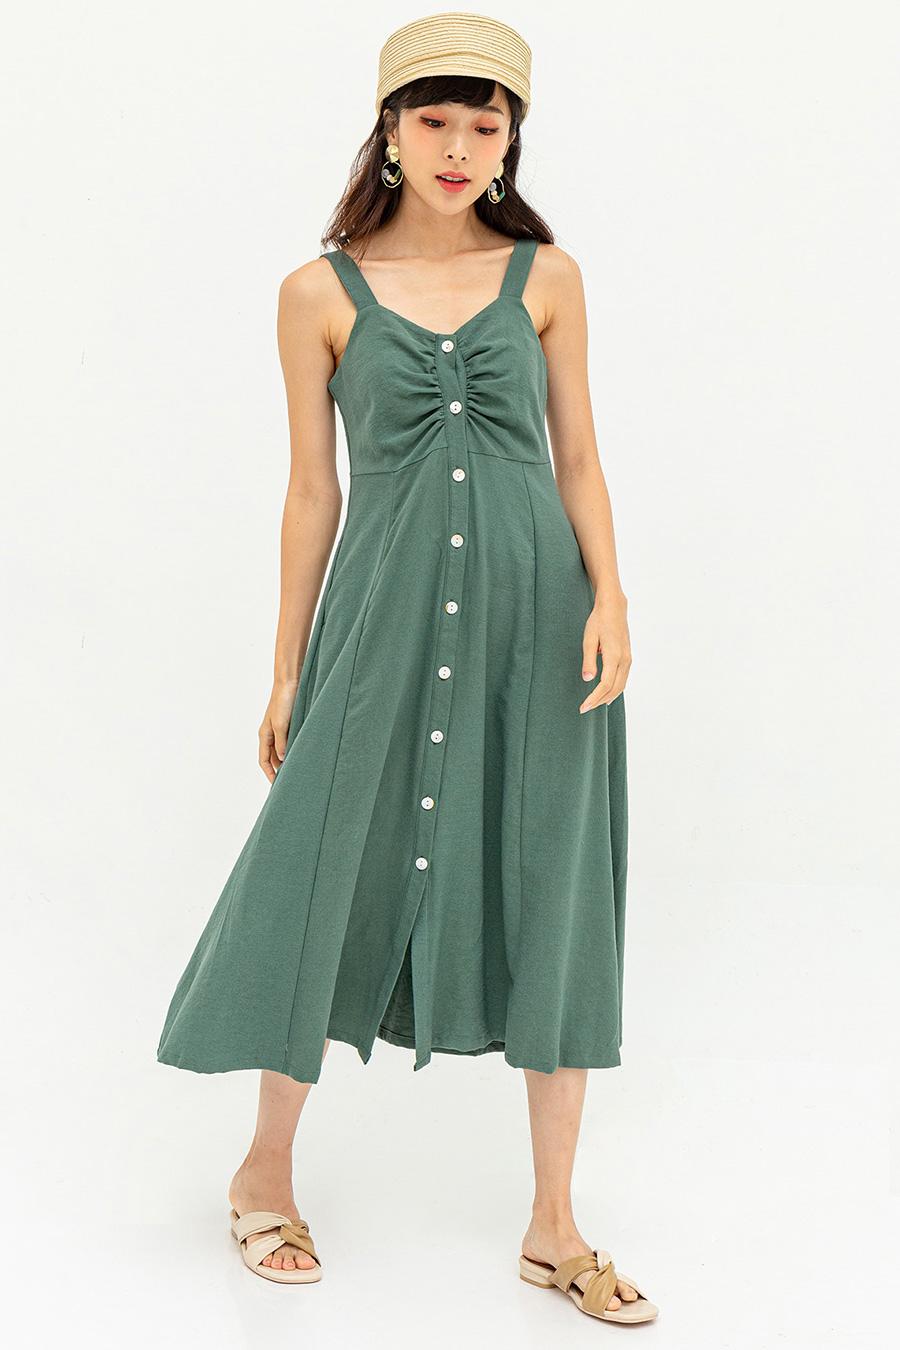 MARSTON DRESS - GARDEN GREEN [BY MODPARADE]